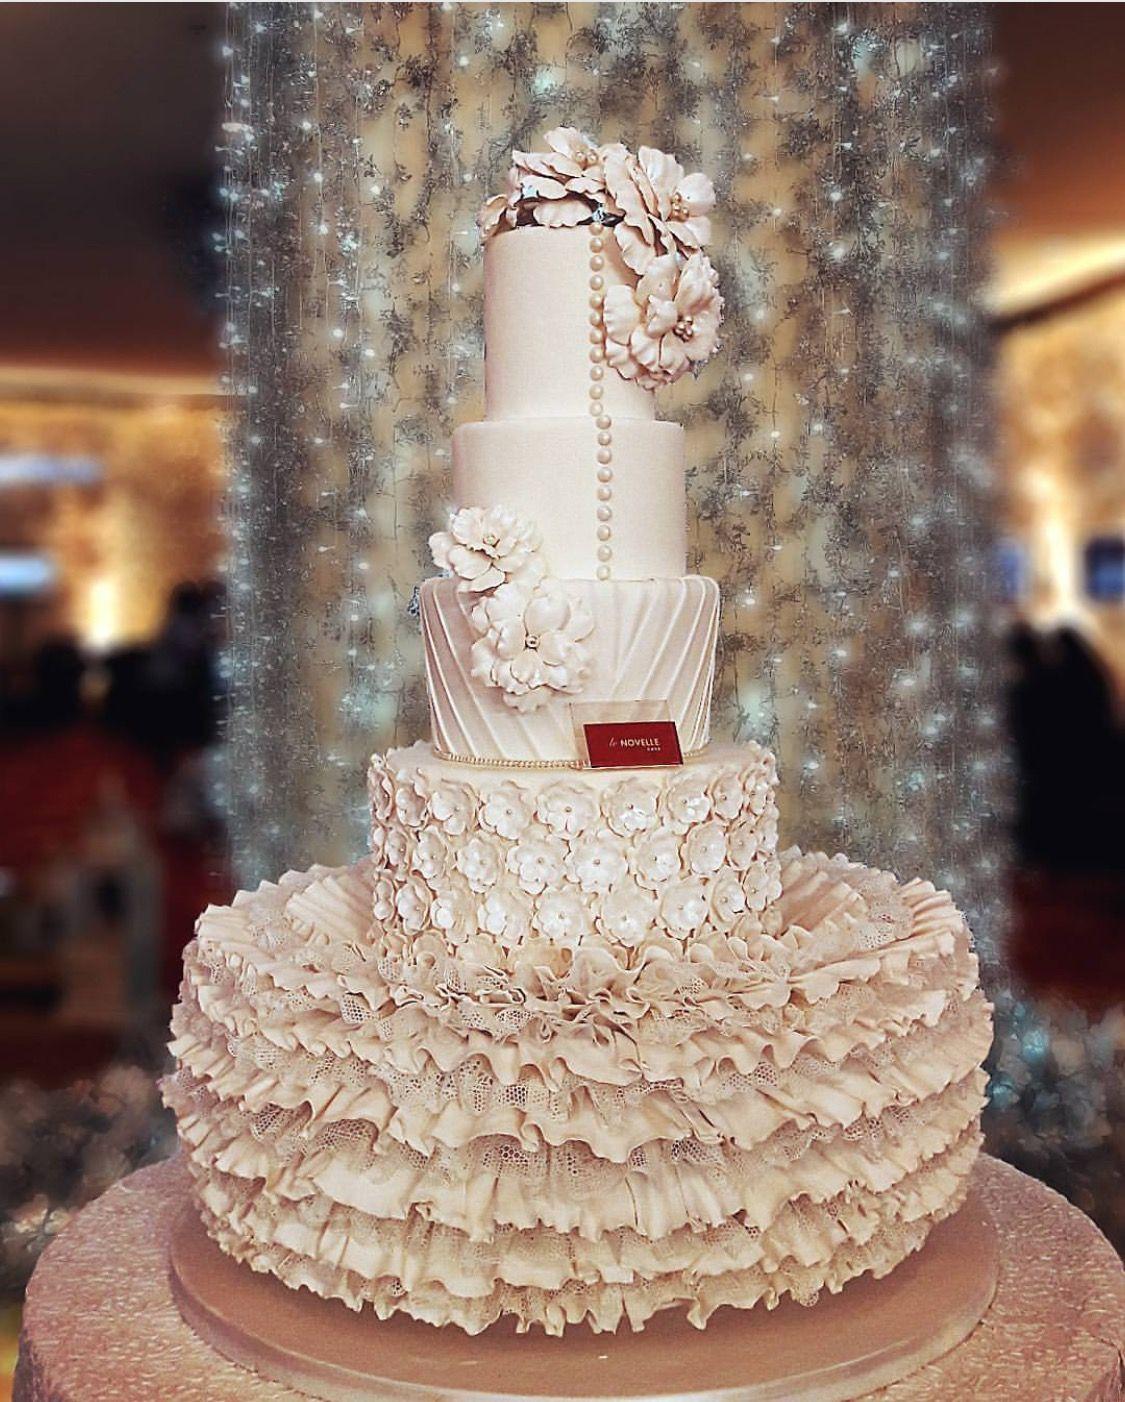 Pin by Cheri Cavanaugh on Cakes Cake, Ballerina cakes